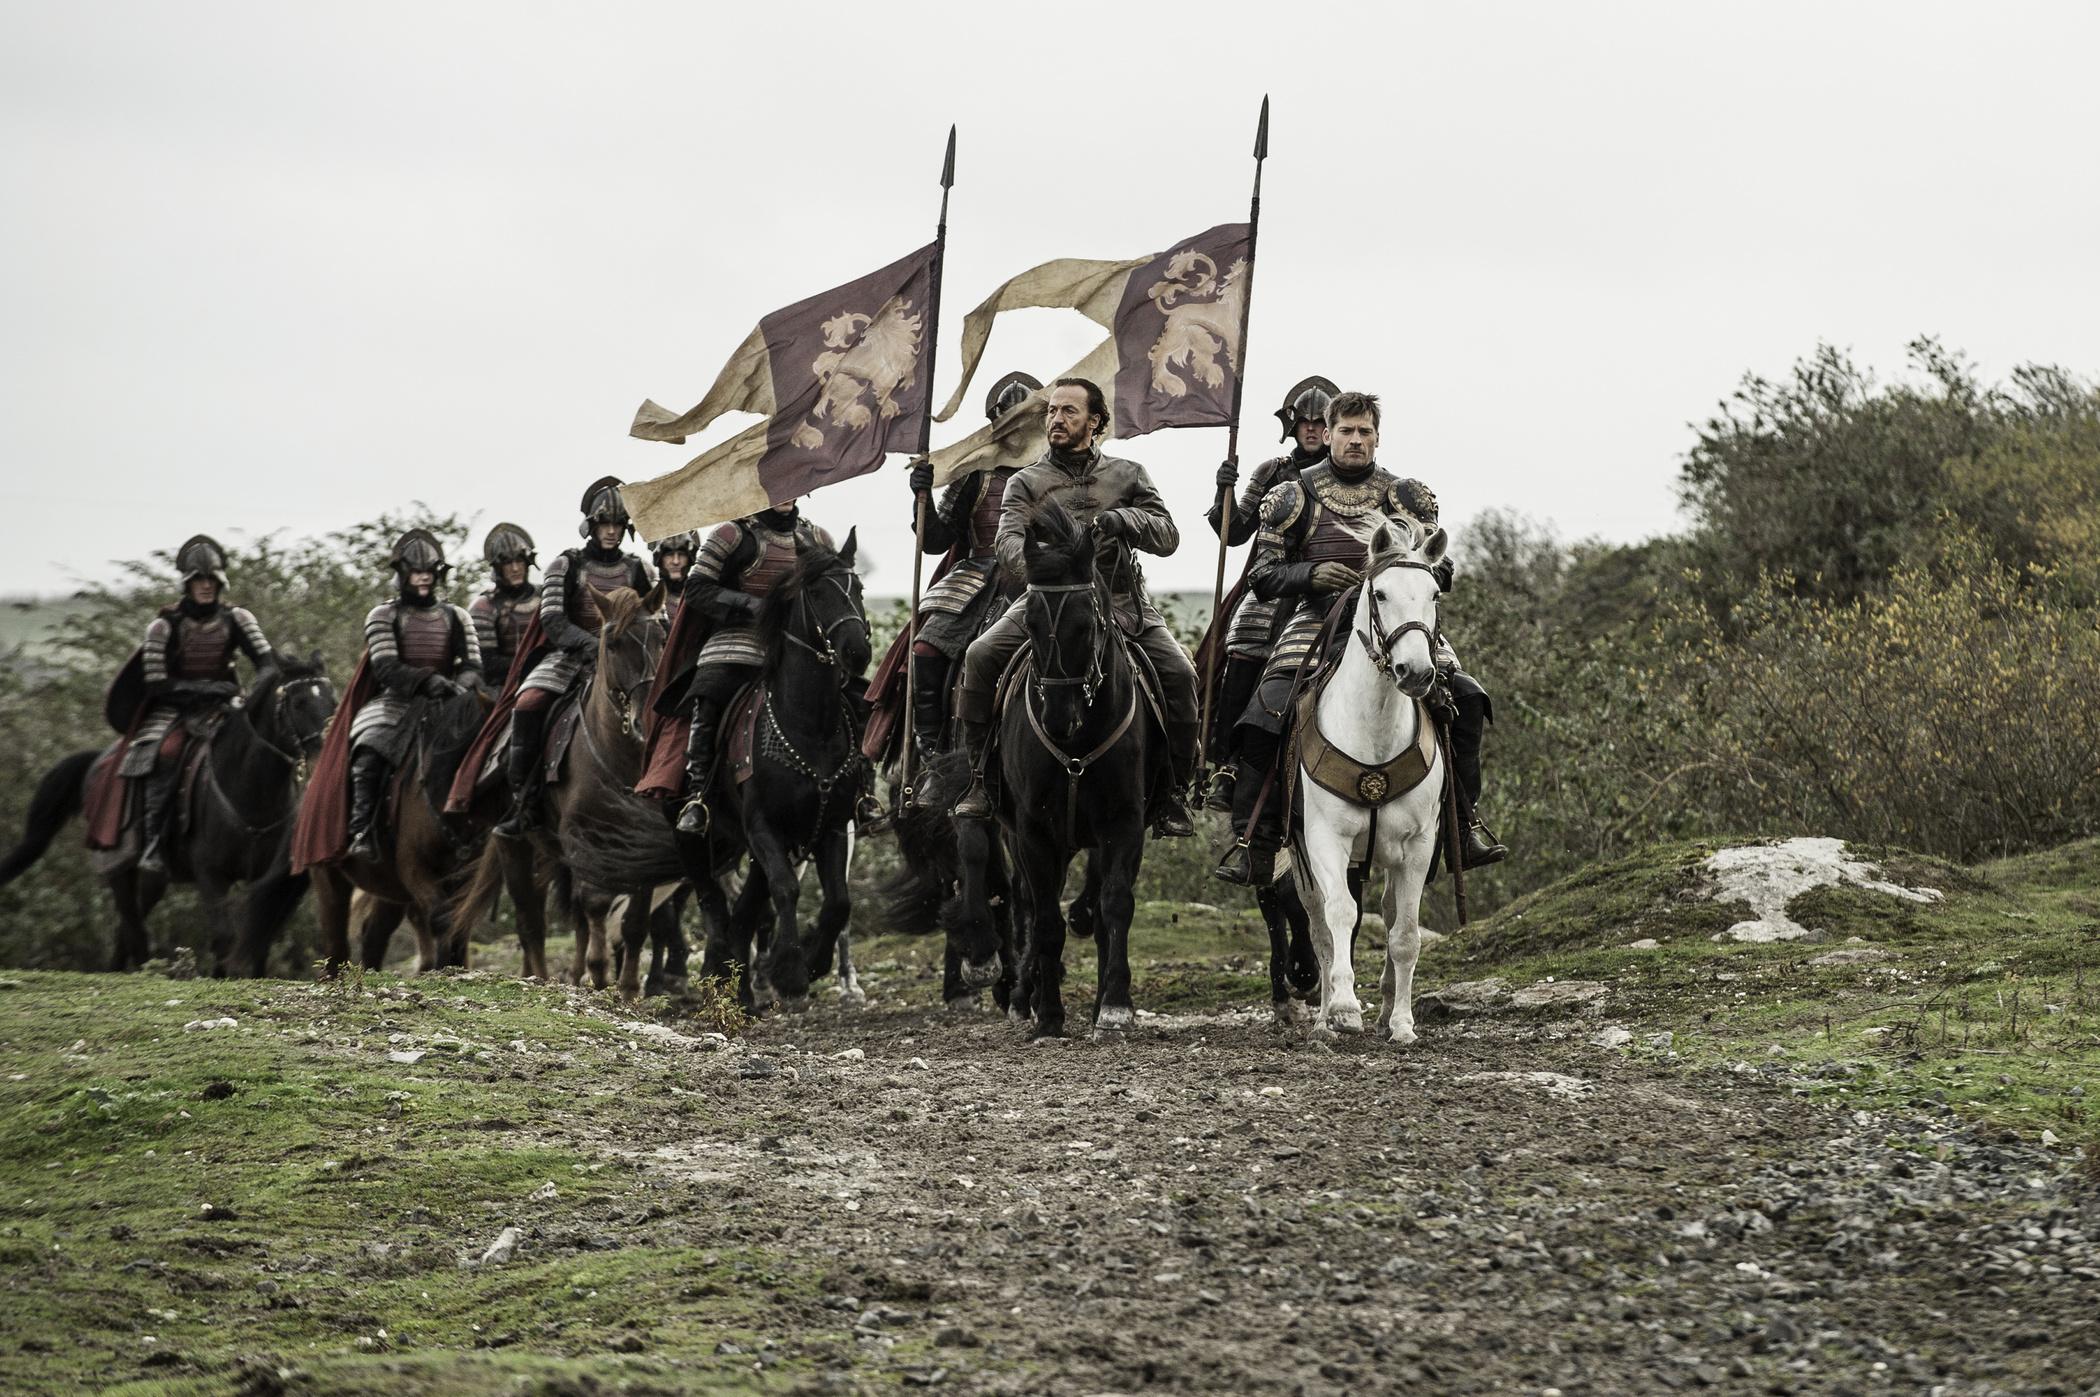 Game of thrones 610 - Jaime and Bronn on horseback